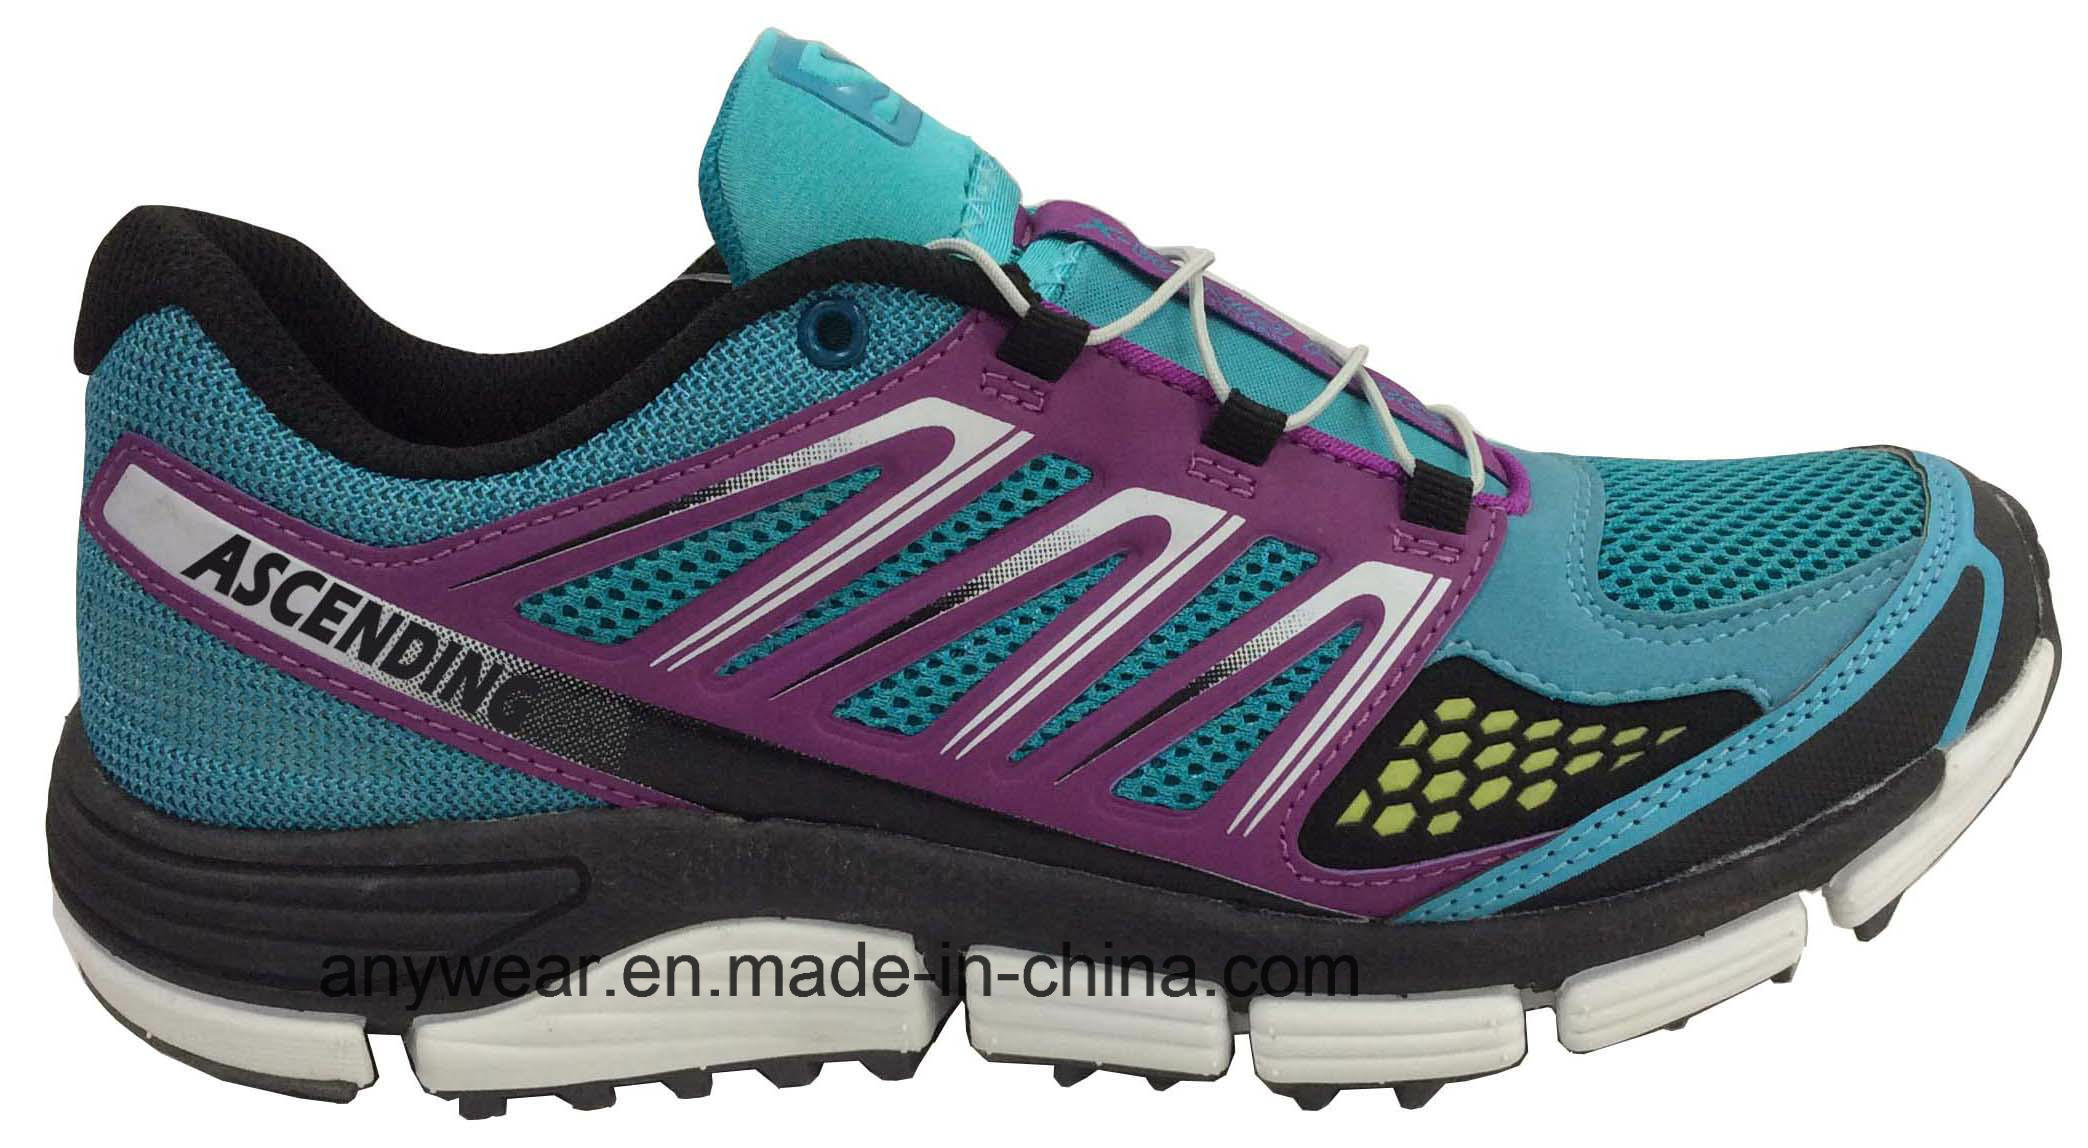 Athletic Women Running Footwear Ladies Gym Sports Shoes (515-7517)